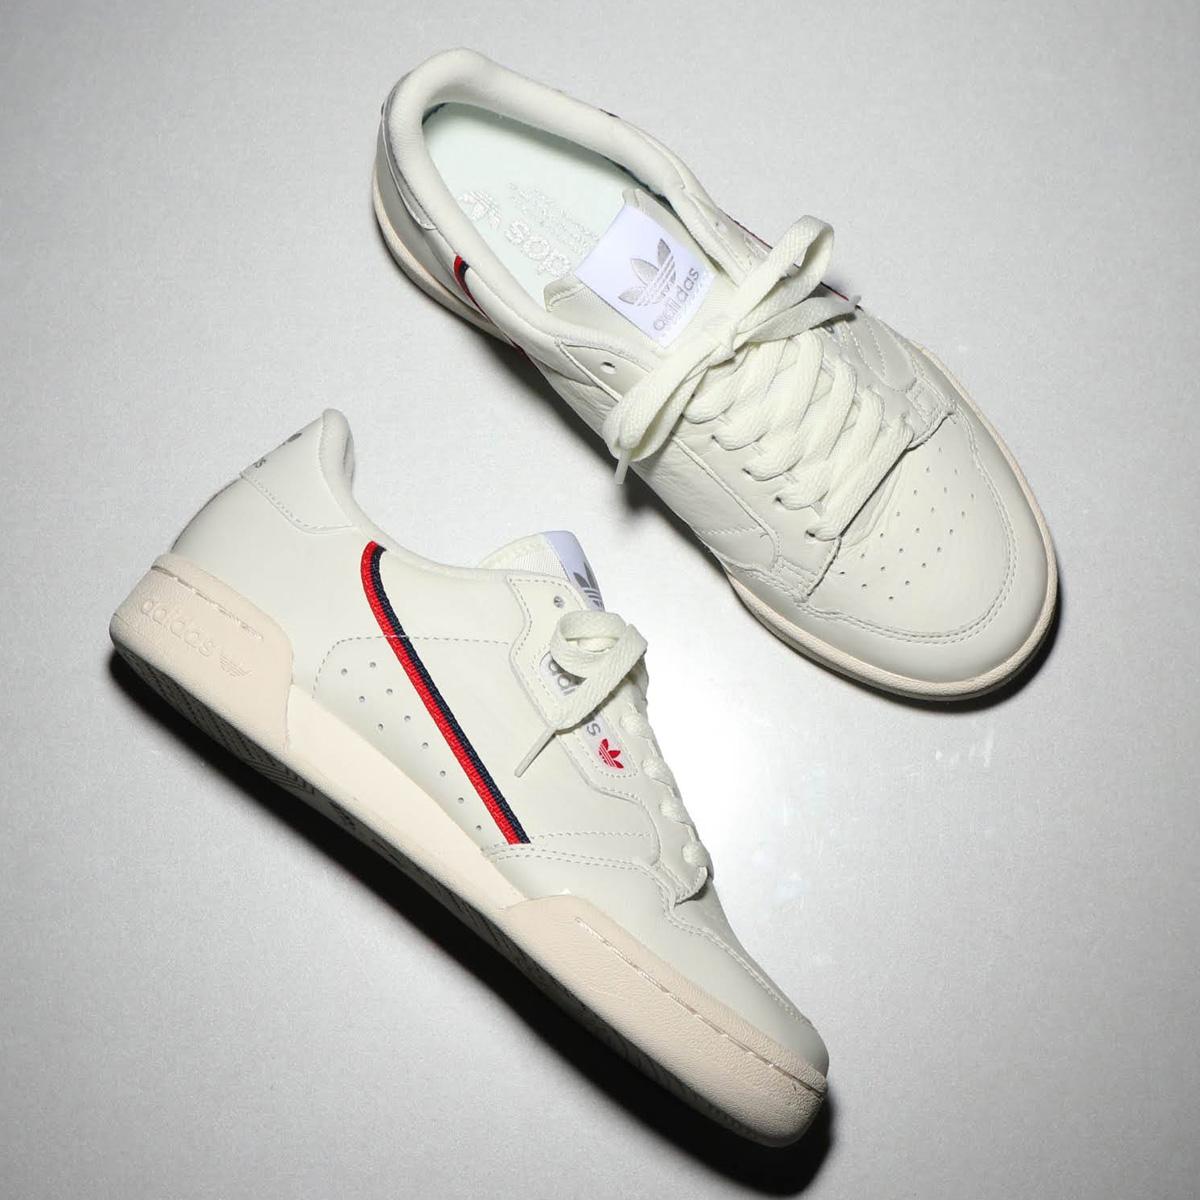 adidas Originals CONTINENTAL 80 (Adidas originals Continental 80) BEIGE/OFF  WHITE/SCARLET 18FW-I